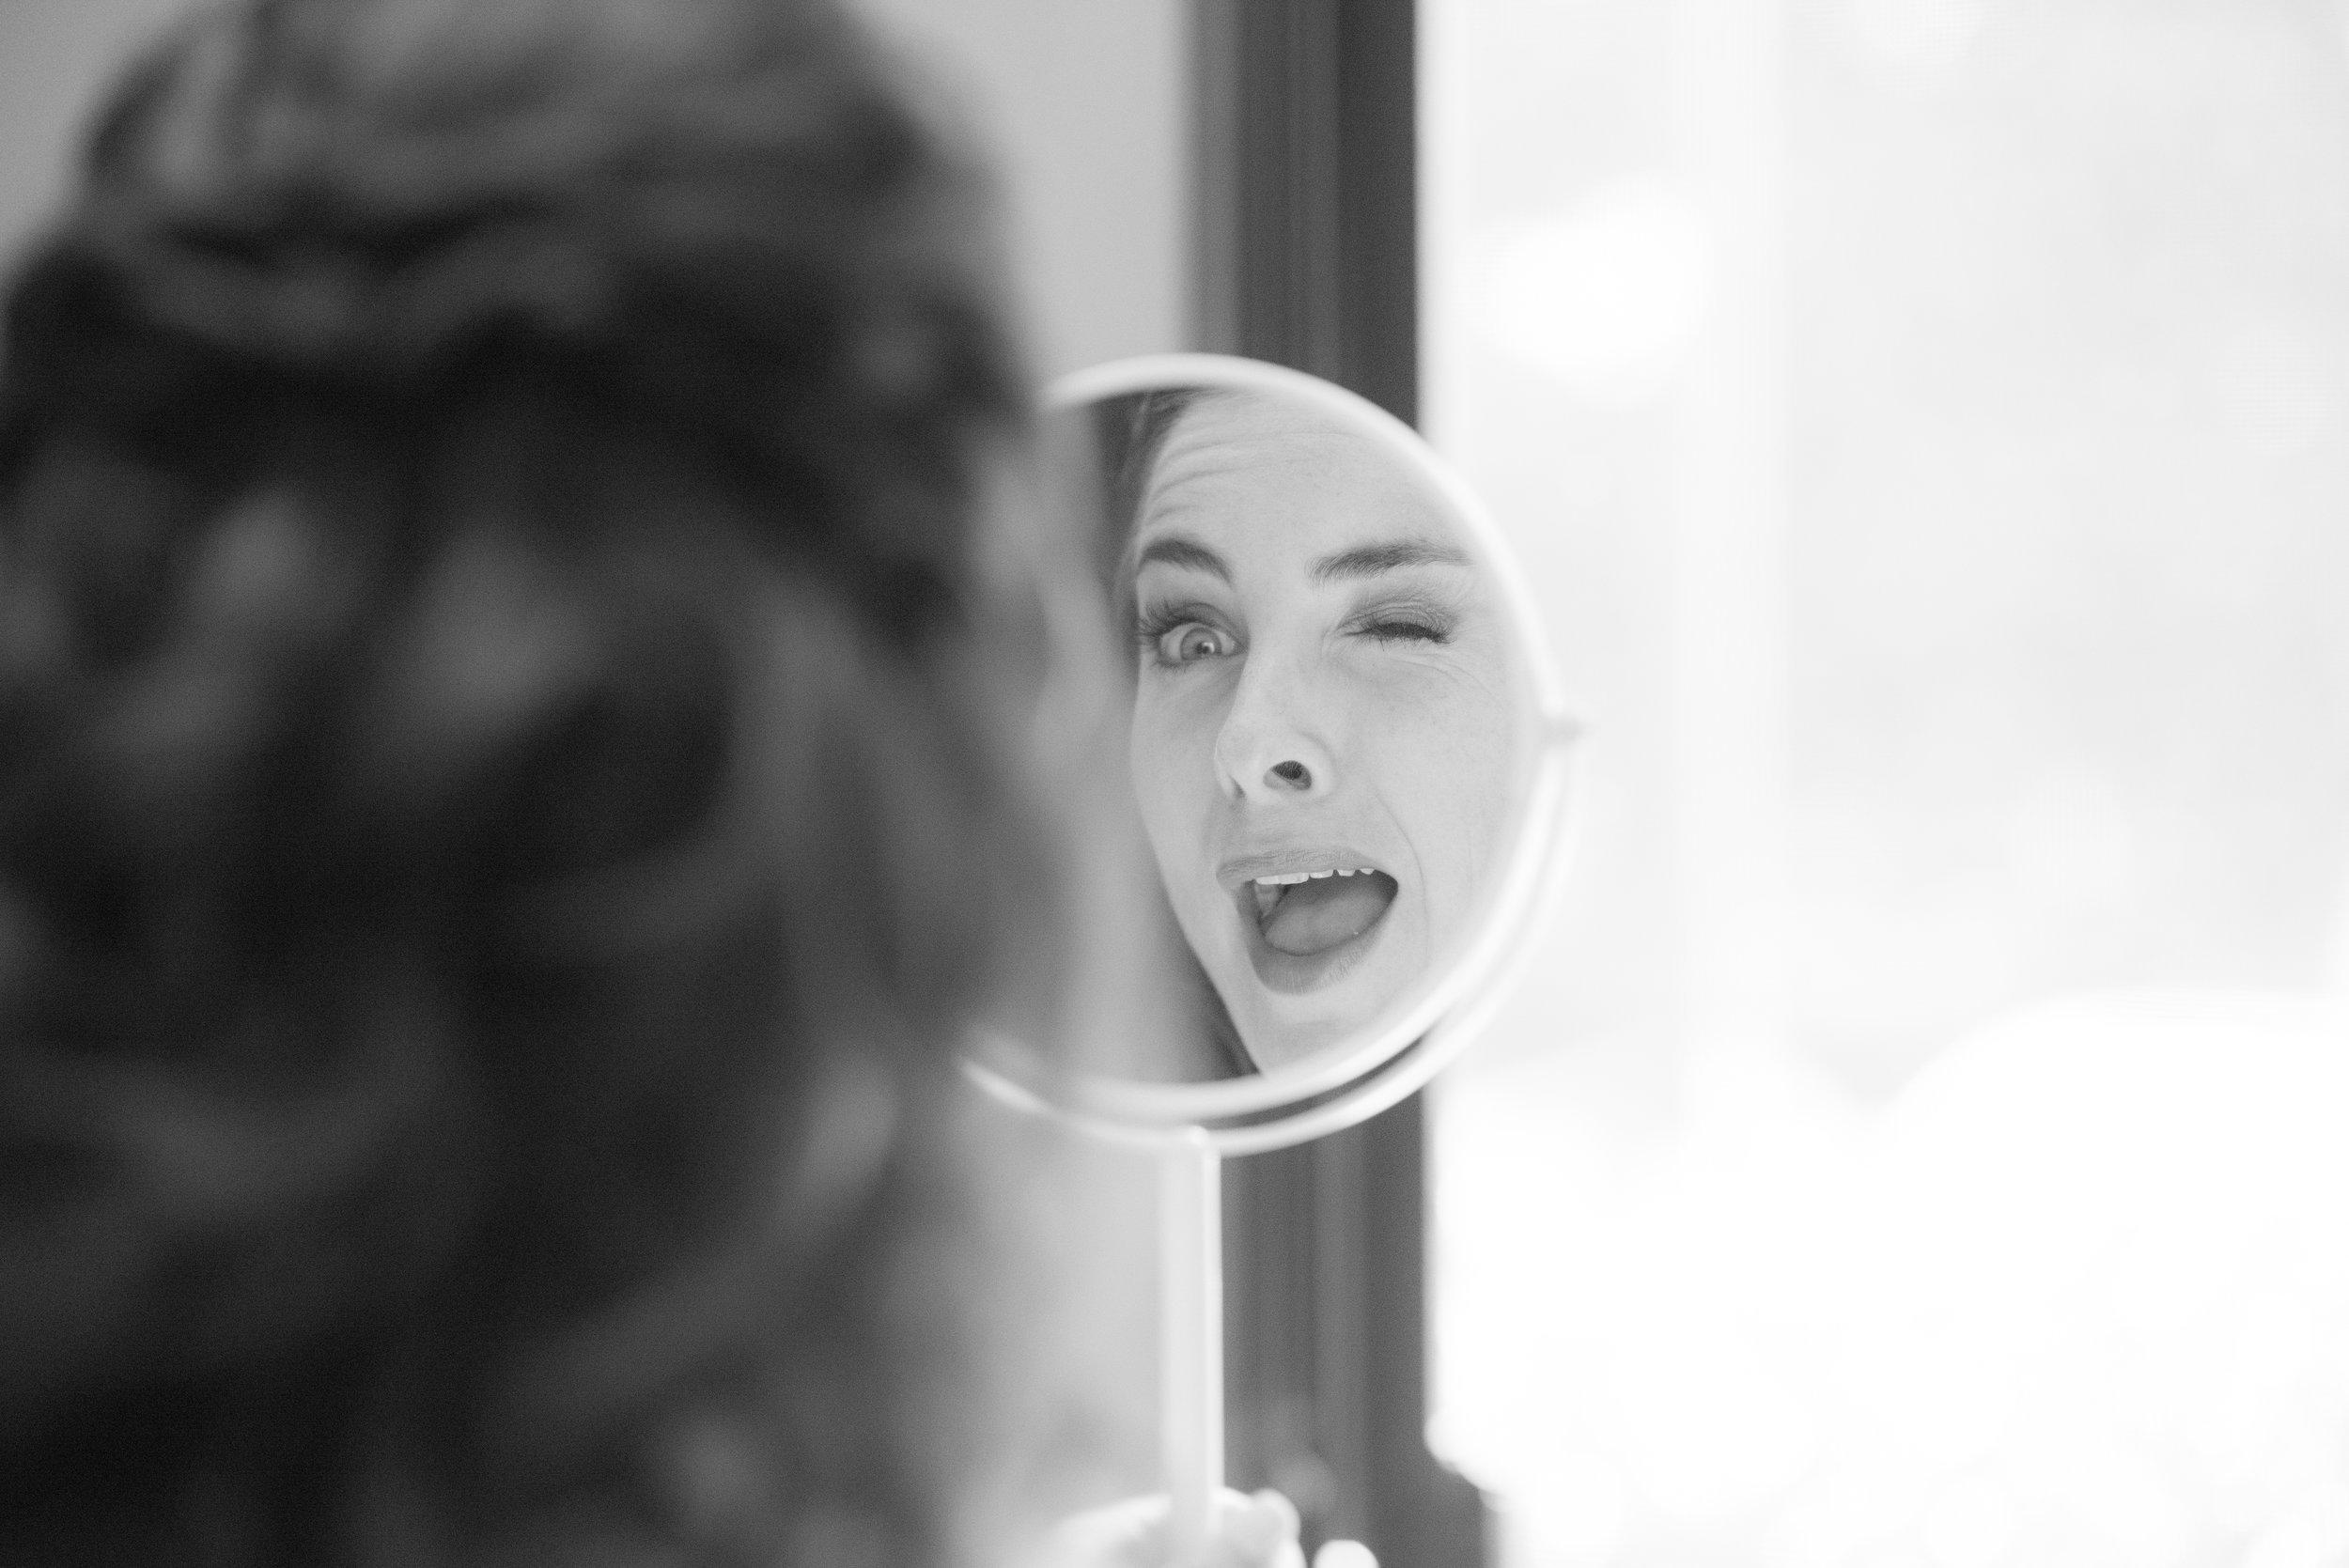 mirror-mirror.jpg